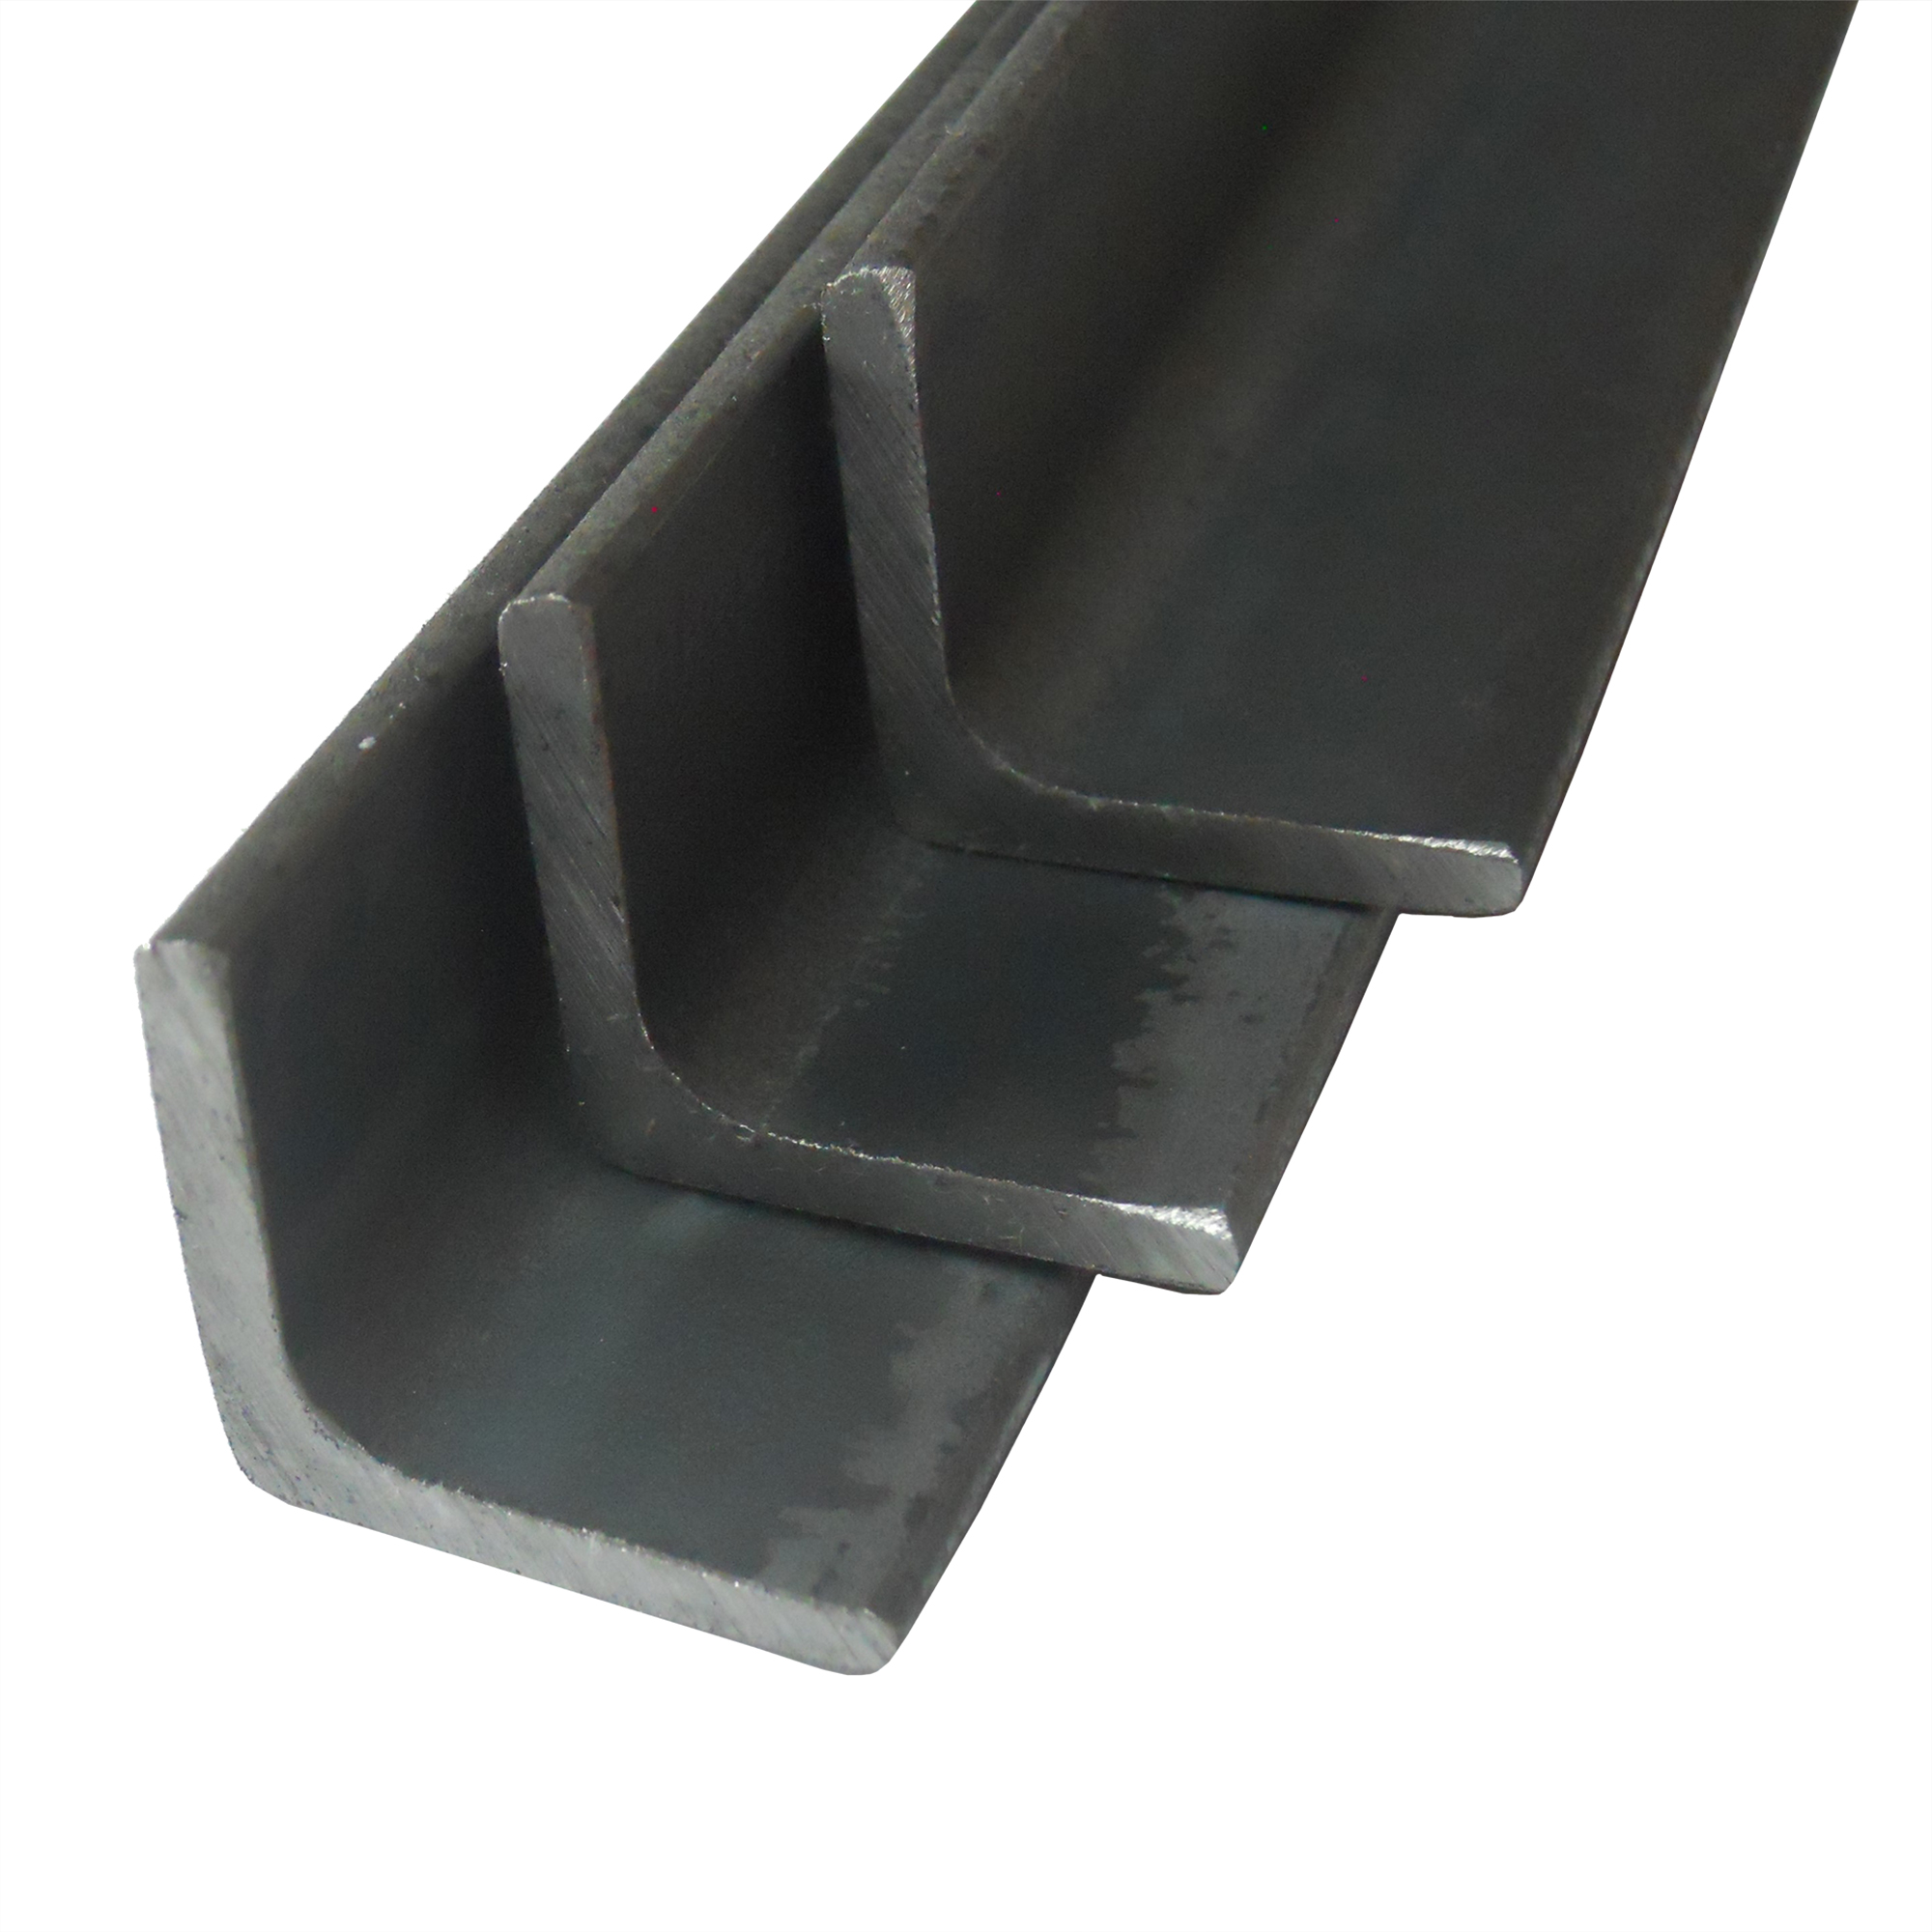 VA Winkel Edelstahl V2A Winkeleisen Oberfl/äche blank L/änge 100 mm Abmessungen 25 x 25 x 3 mm